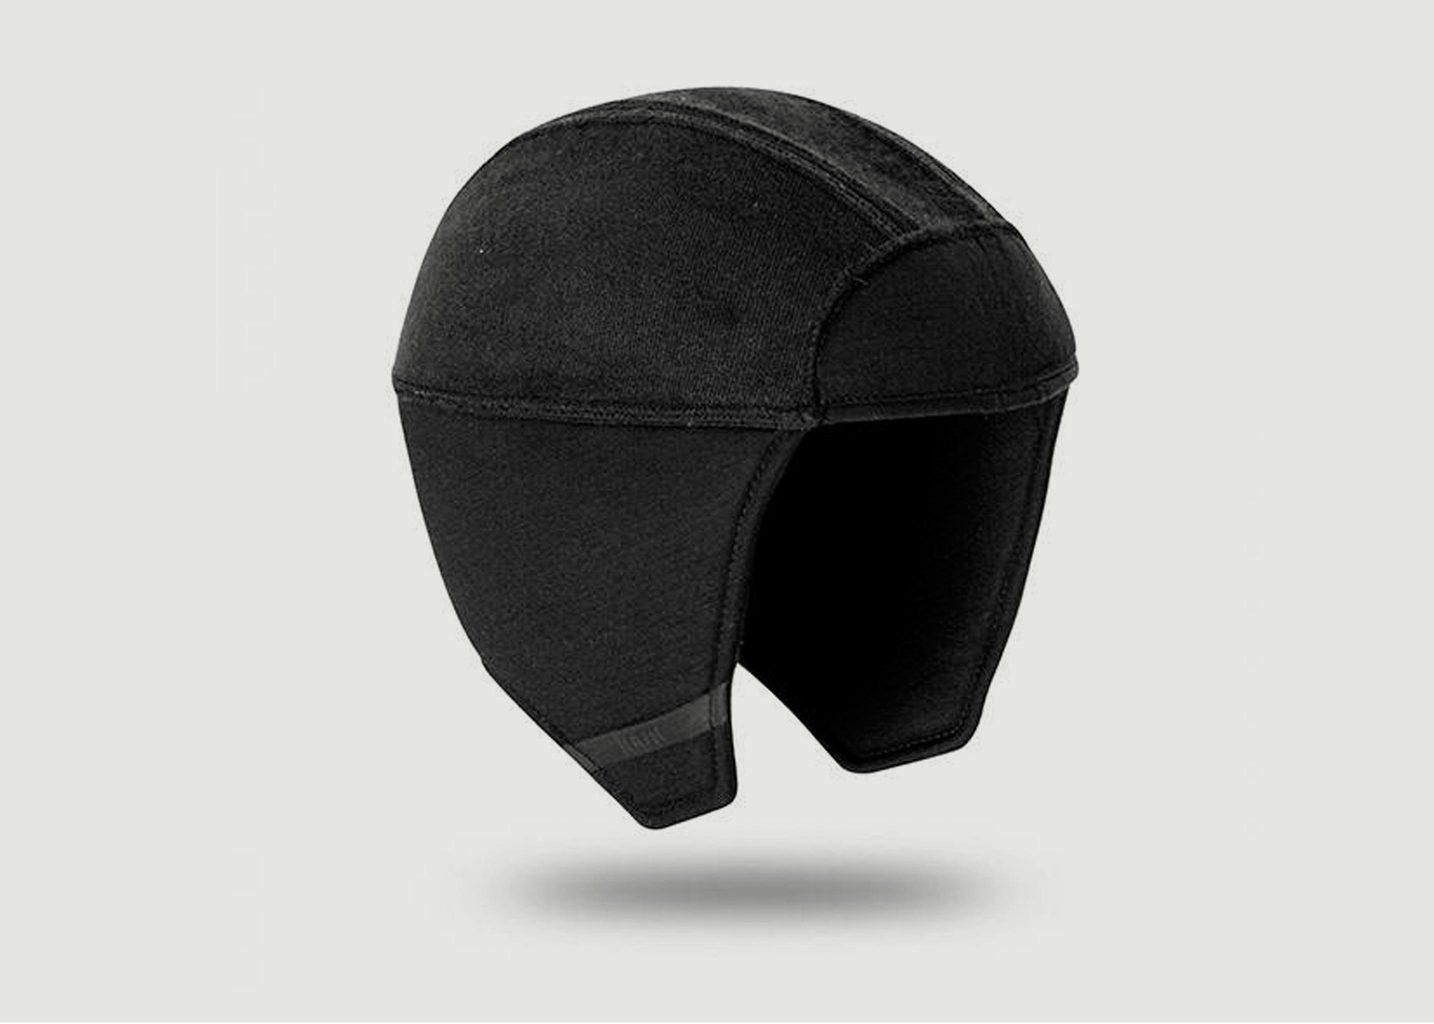 Protège tête hiver - Kask